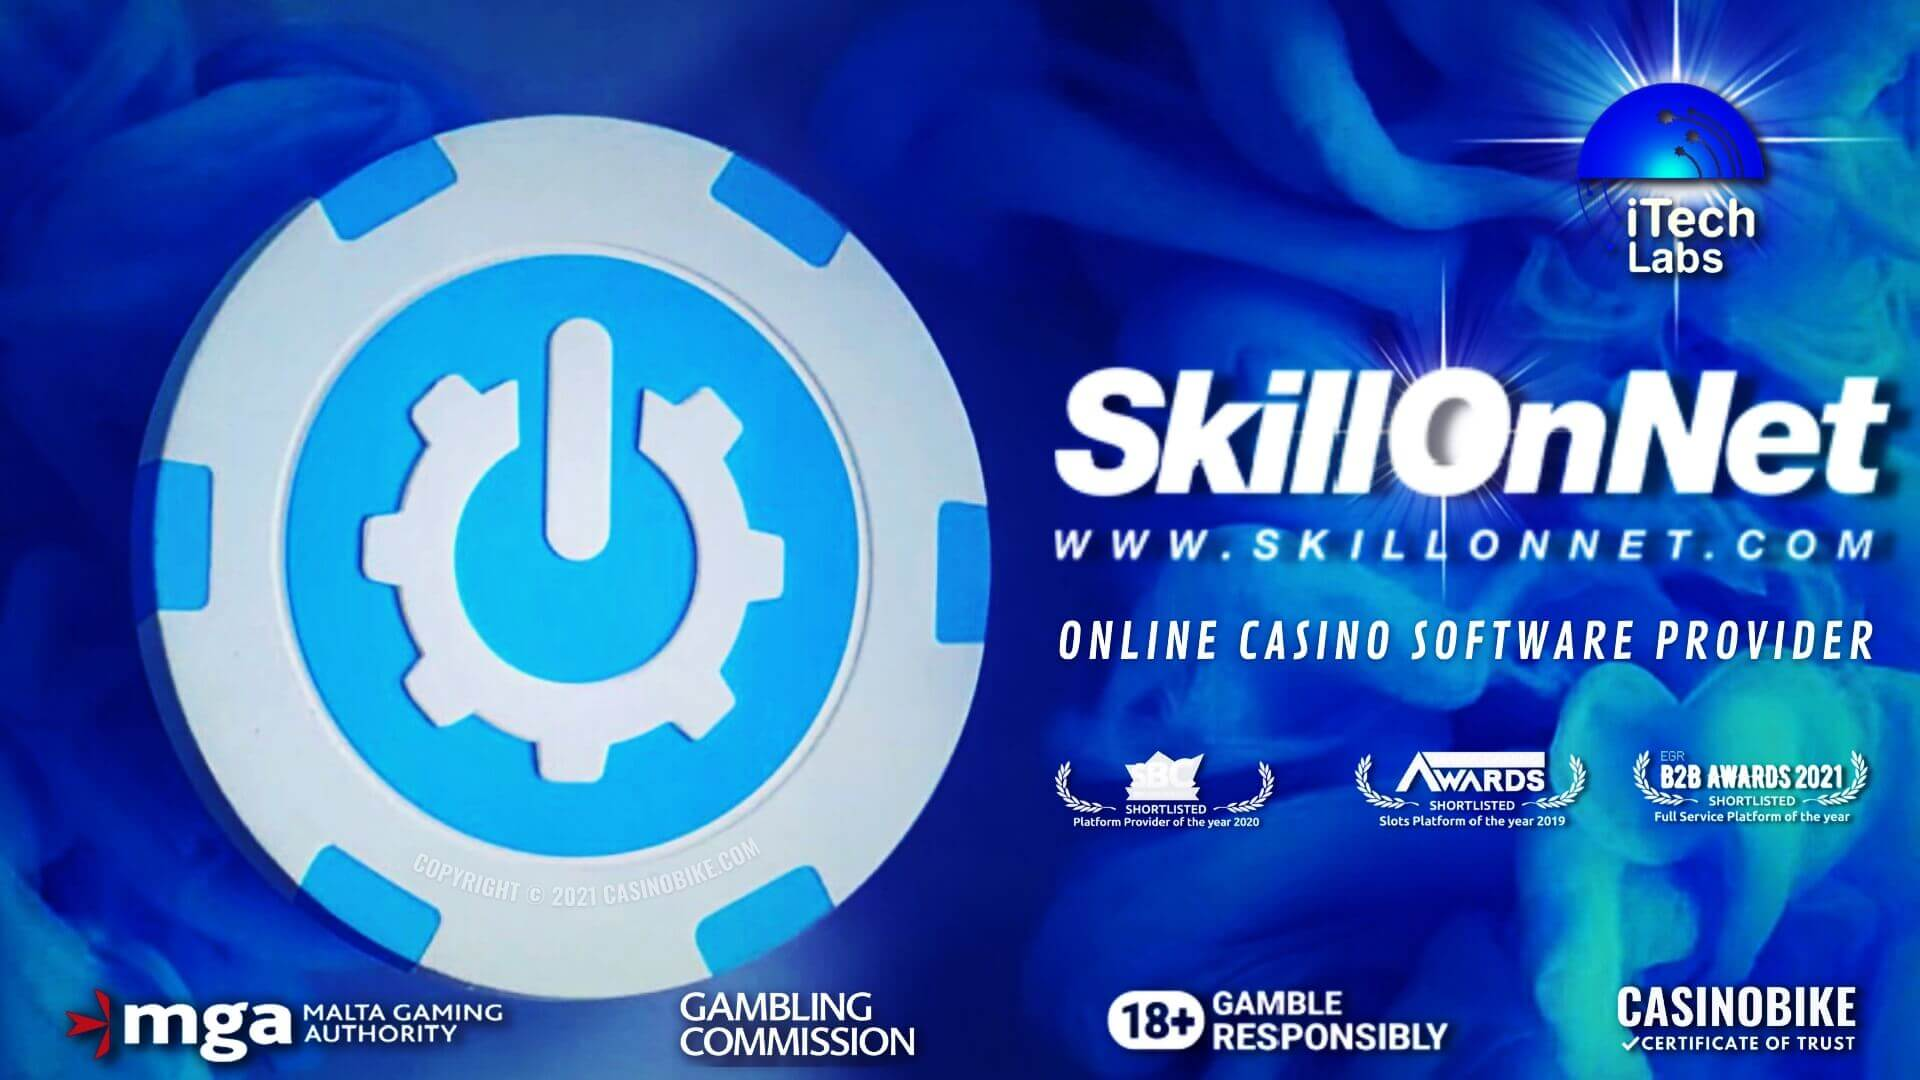 SkillOneNet Online Casino Software Provider